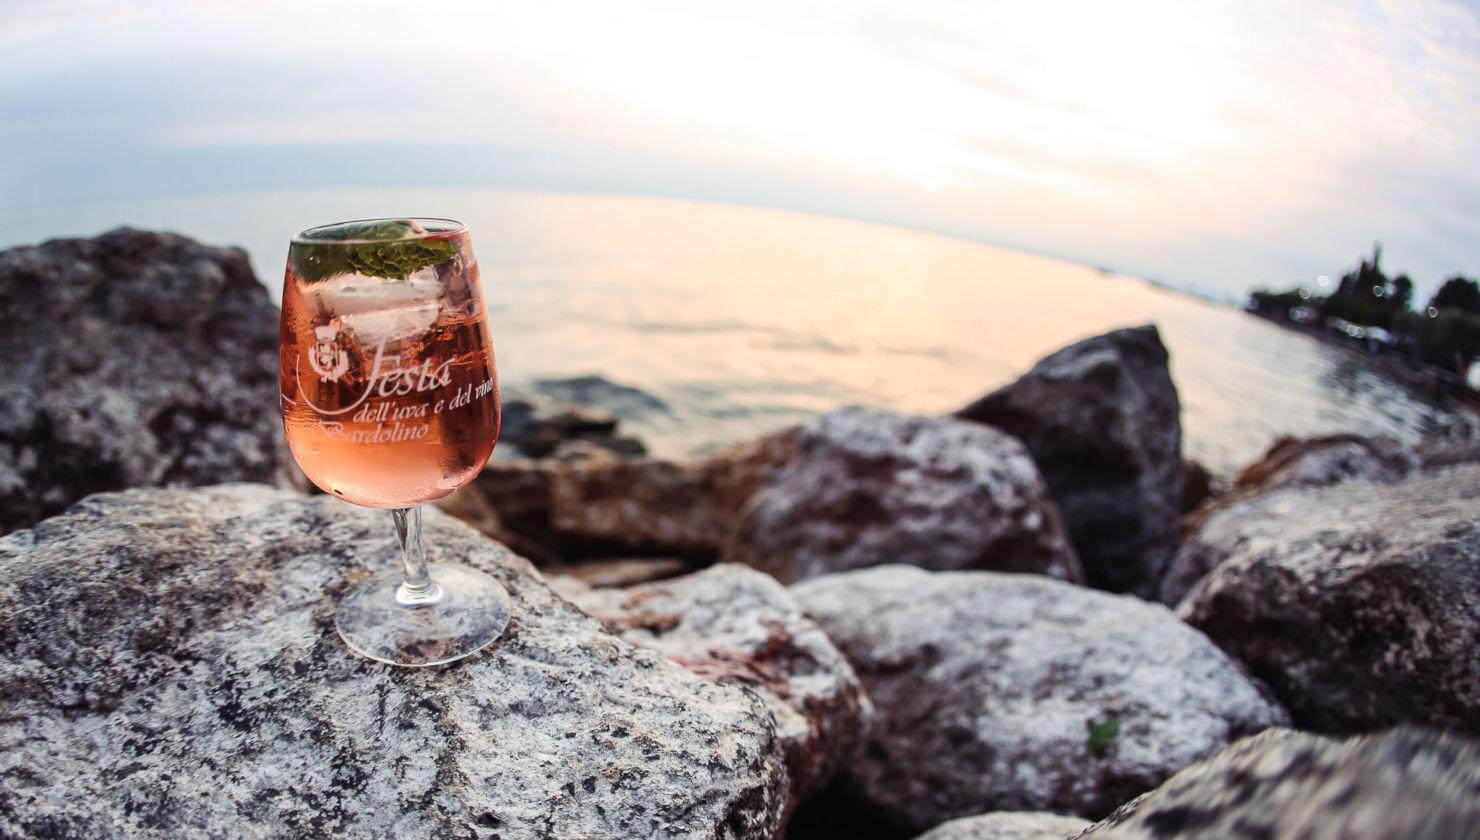 89° Festa dell'uva e del vino Bardolino (VR)